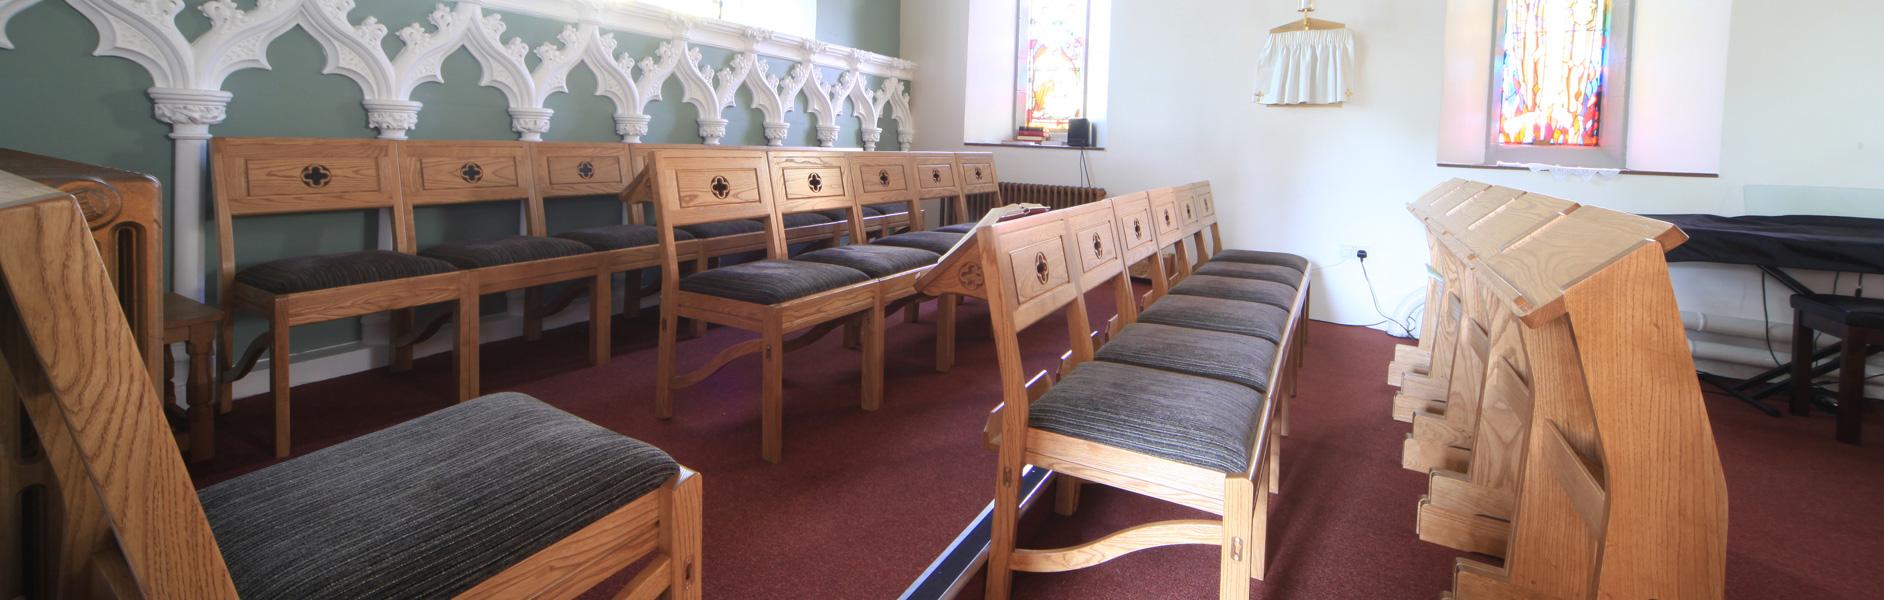 ICS chairs in St. Matthew's Chadderton